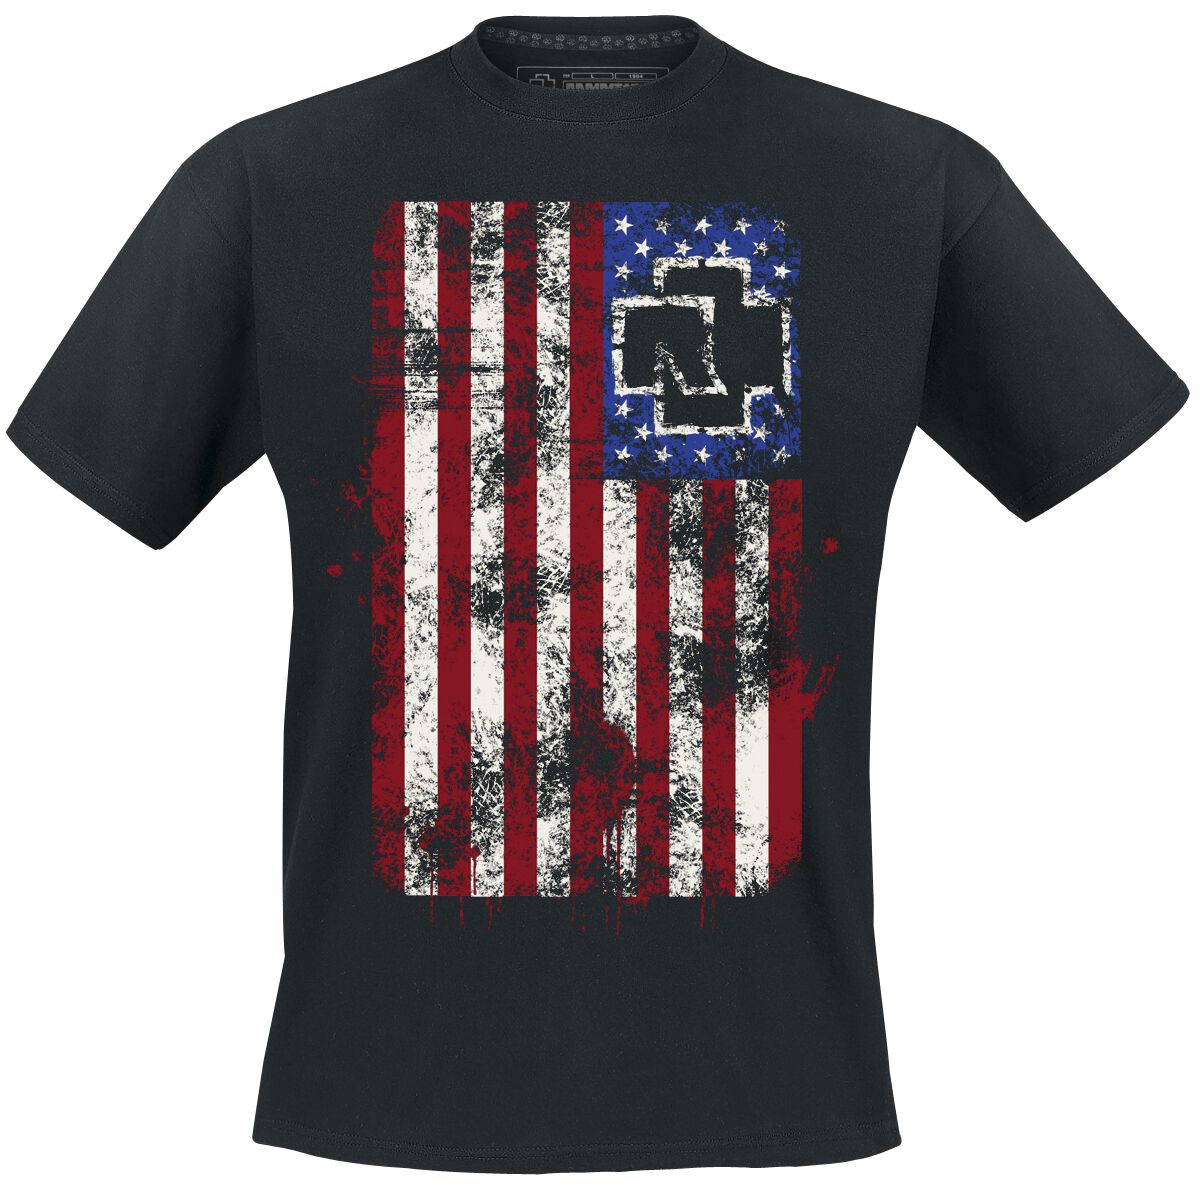 amerika rammstein t shirt large. Black Bedroom Furniture Sets. Home Design Ideas